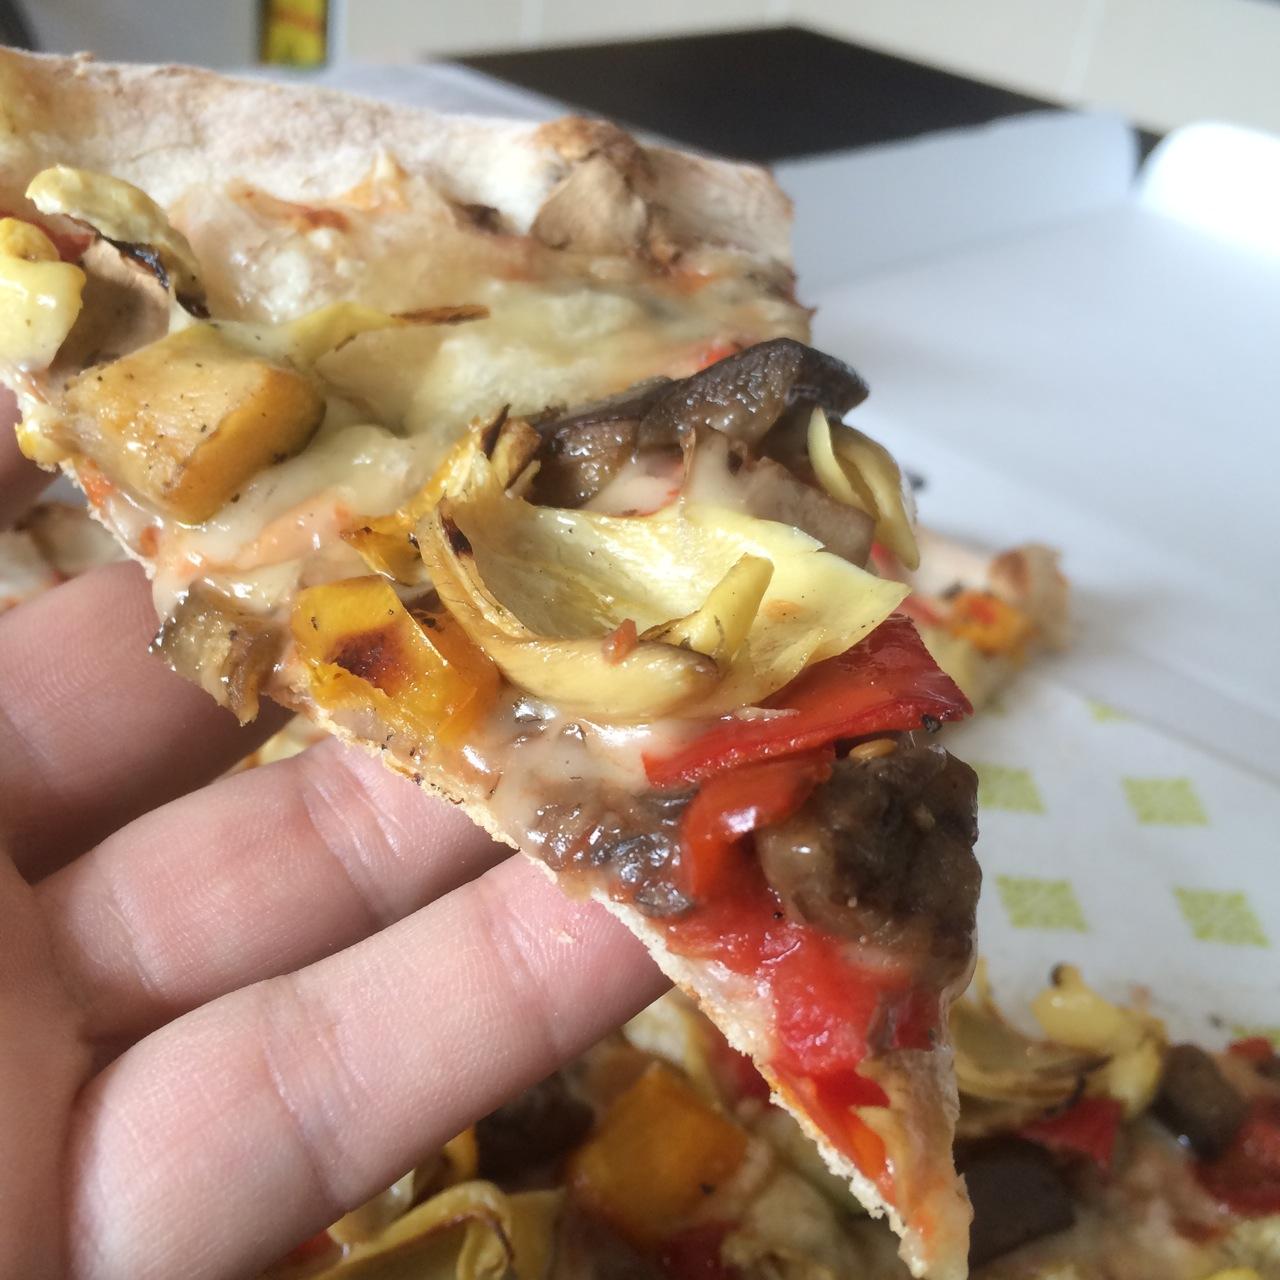 http://i0.wp.com/fatgayvegan.com/wp-content/uploads/2015/09/vegan-pizza-slice-firezza.jpg?fit=1280%2C1280